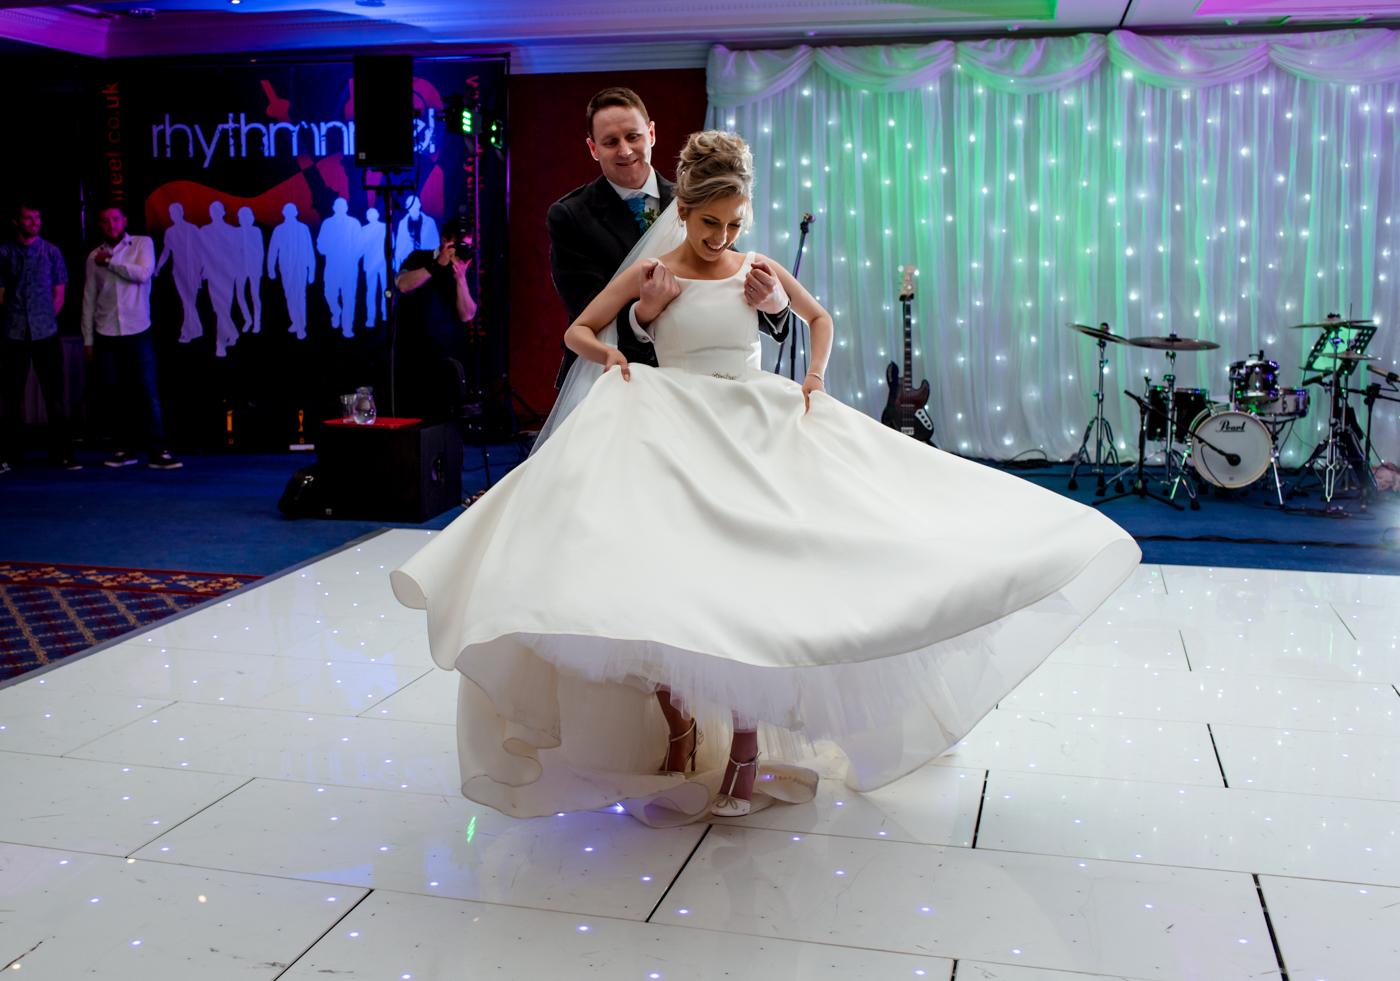 nairn wedding dancing photos newton hotel